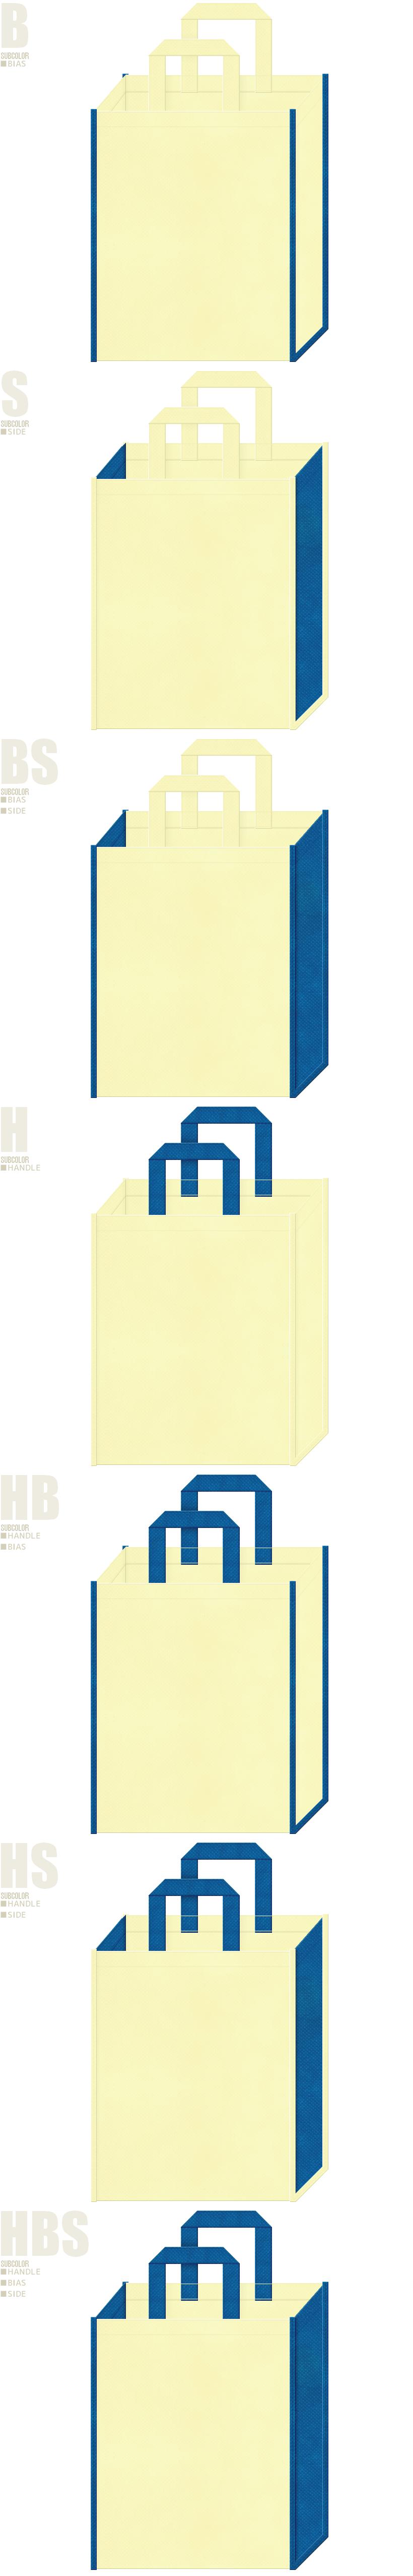 IT・IOT・LED・センサー・ライト・電子部品の展示会用バッグにお奨めの不織布バッグデザイン:薄黄色と青色の配色7パターン